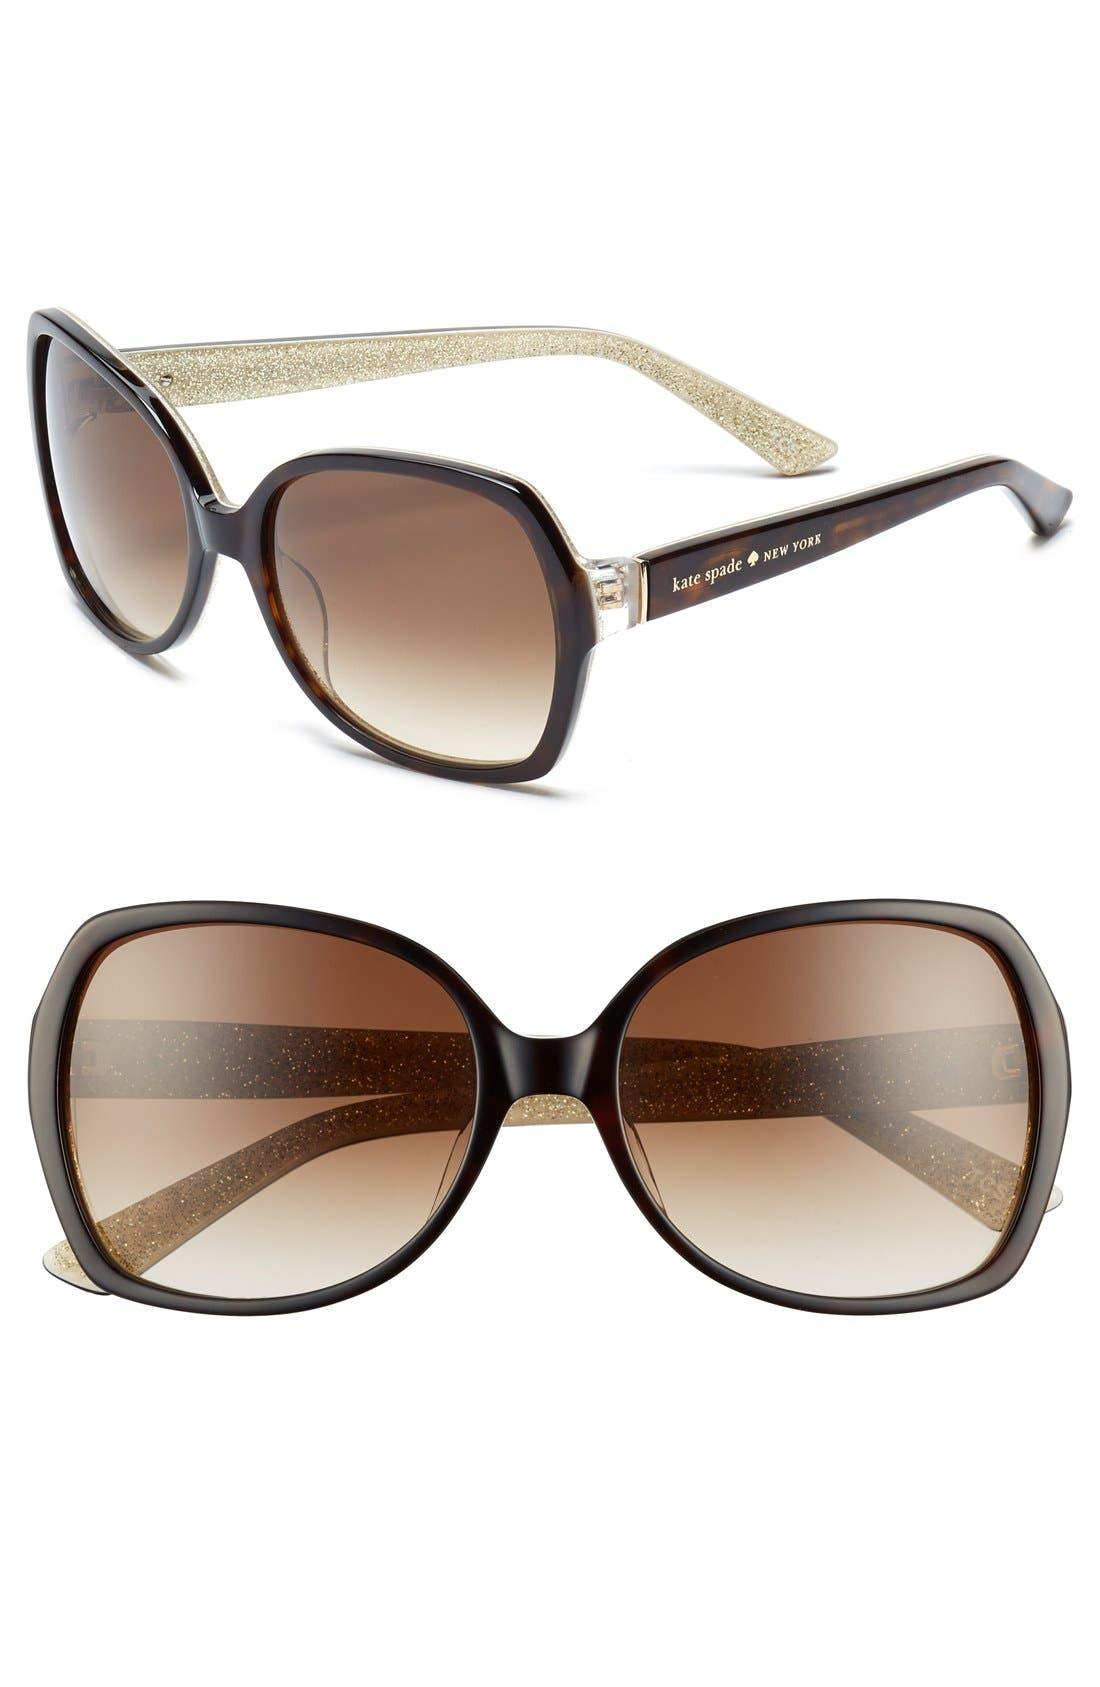 Main Image - kate spade new york 'halsey' 57mm sunglasses